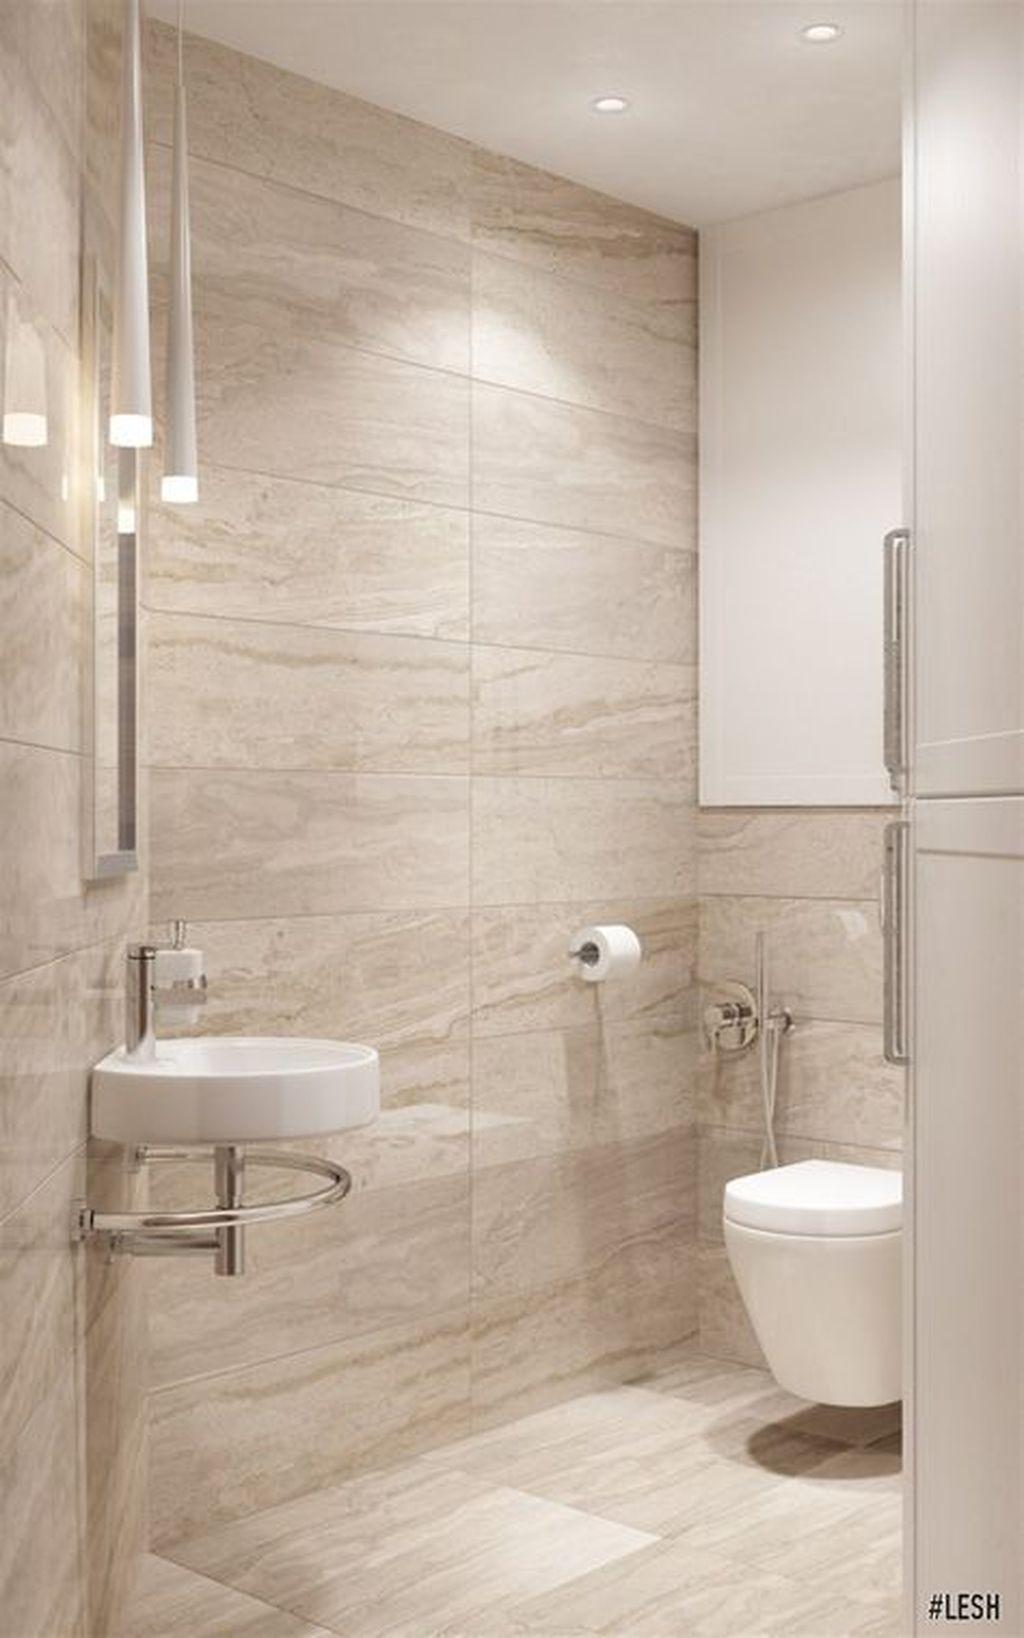 55 Brilliant Bathroom Tile Design Ideas That Very Inspiring In